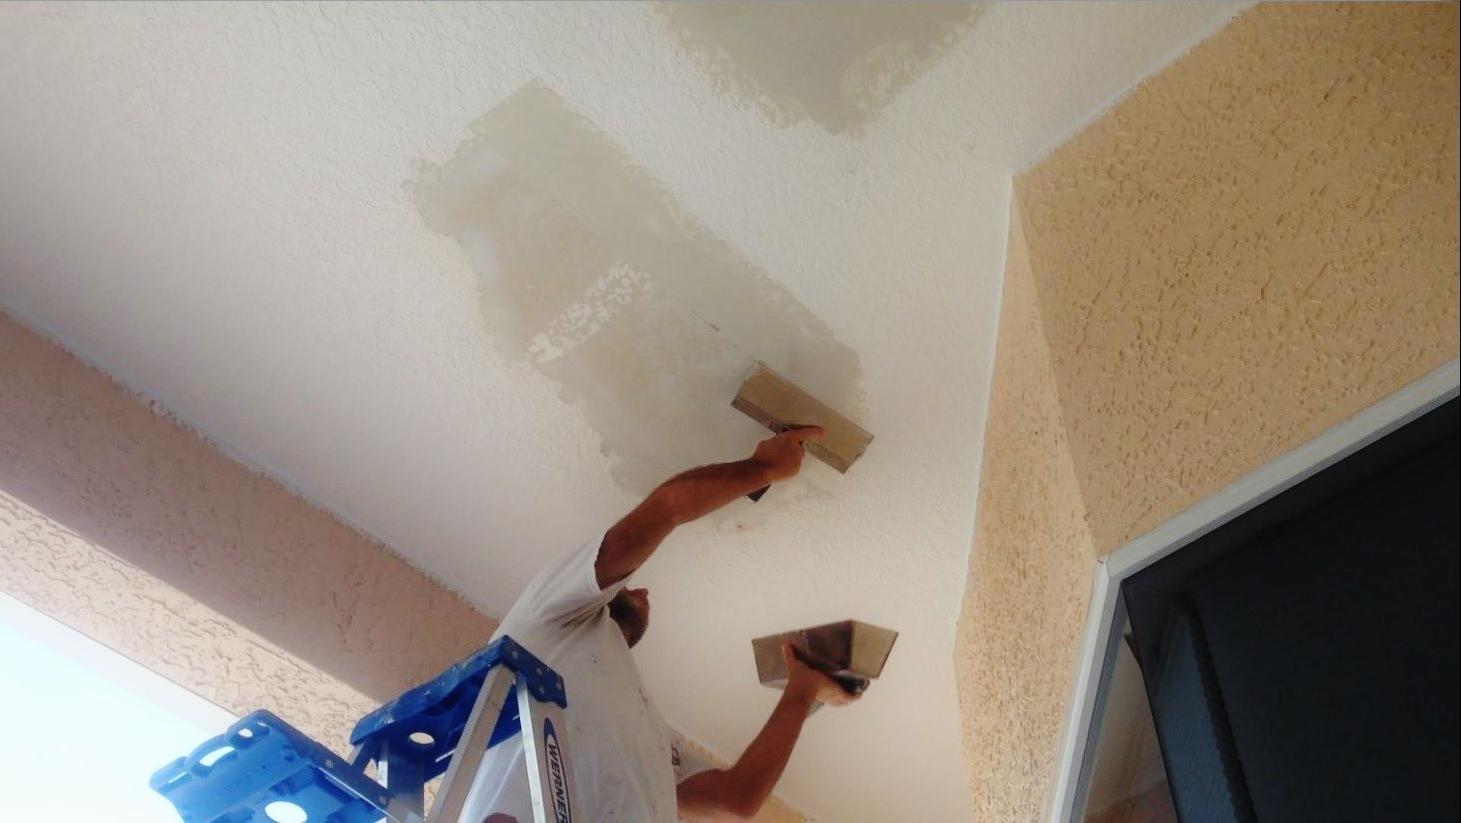 Mudding Ceiling Repair To Match Knockdown Texture Sponge